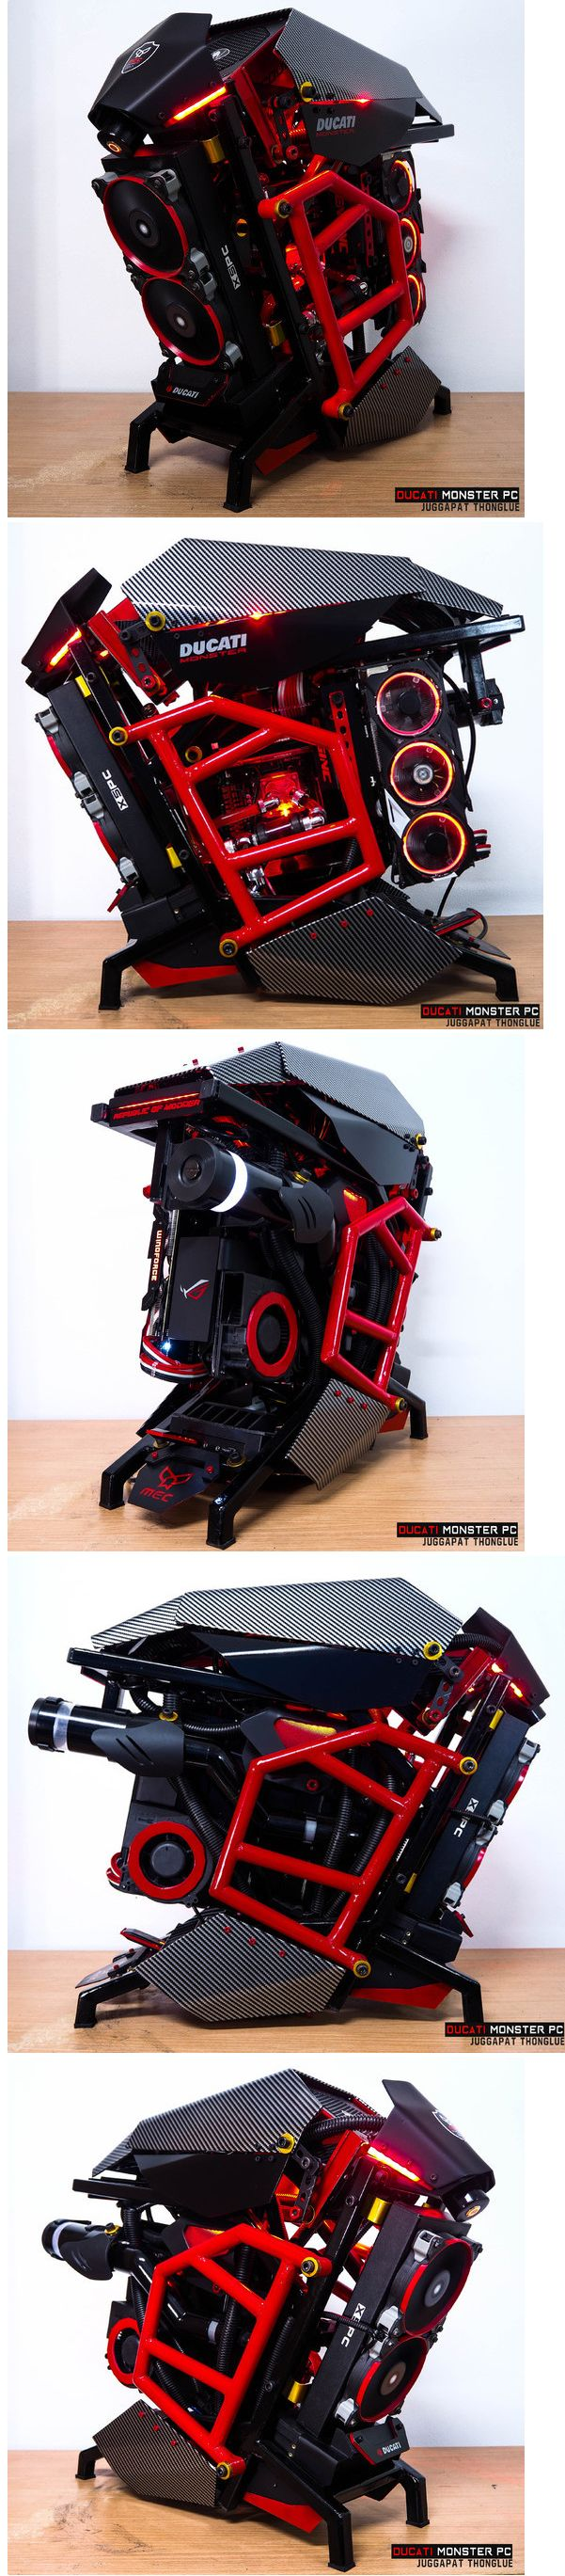 Ducati Monster PC Specs: CPU : Intel Core I7-3770sMB : Biostar TZ77XE4VGA : Gigabyte GTX 970 Extreme PSU : Cougar CMX 700w